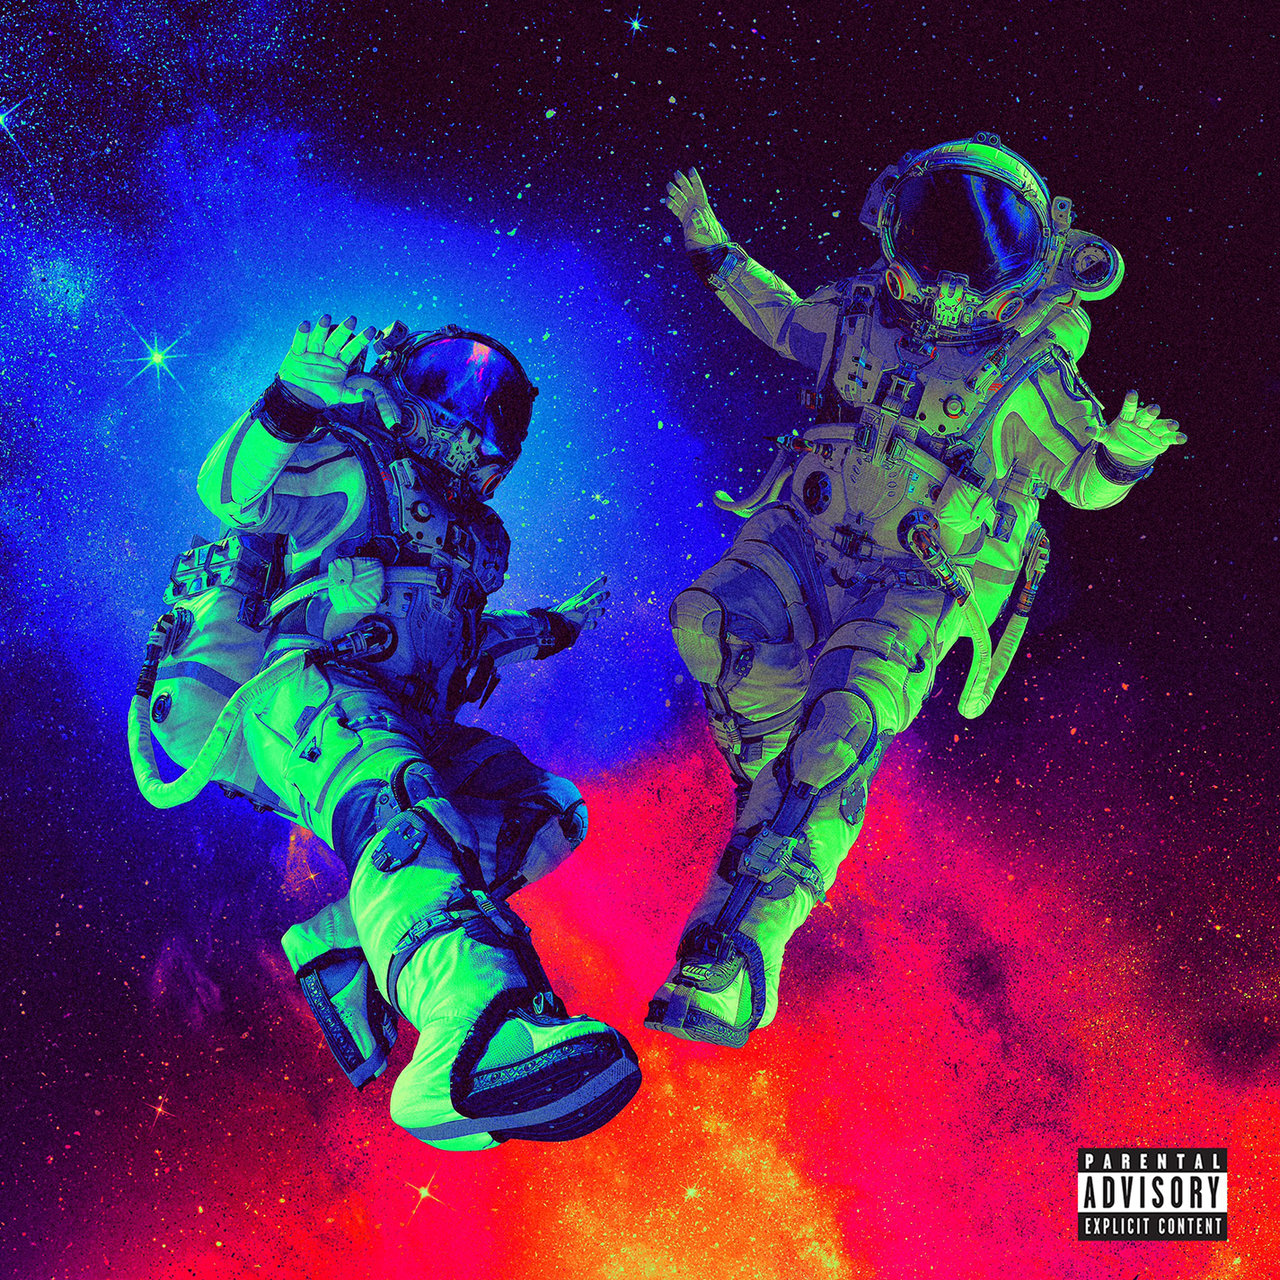 Future & Lil Uzi Vert – 'Pluto x Baby Pluto (Deluxe)' (Stream)